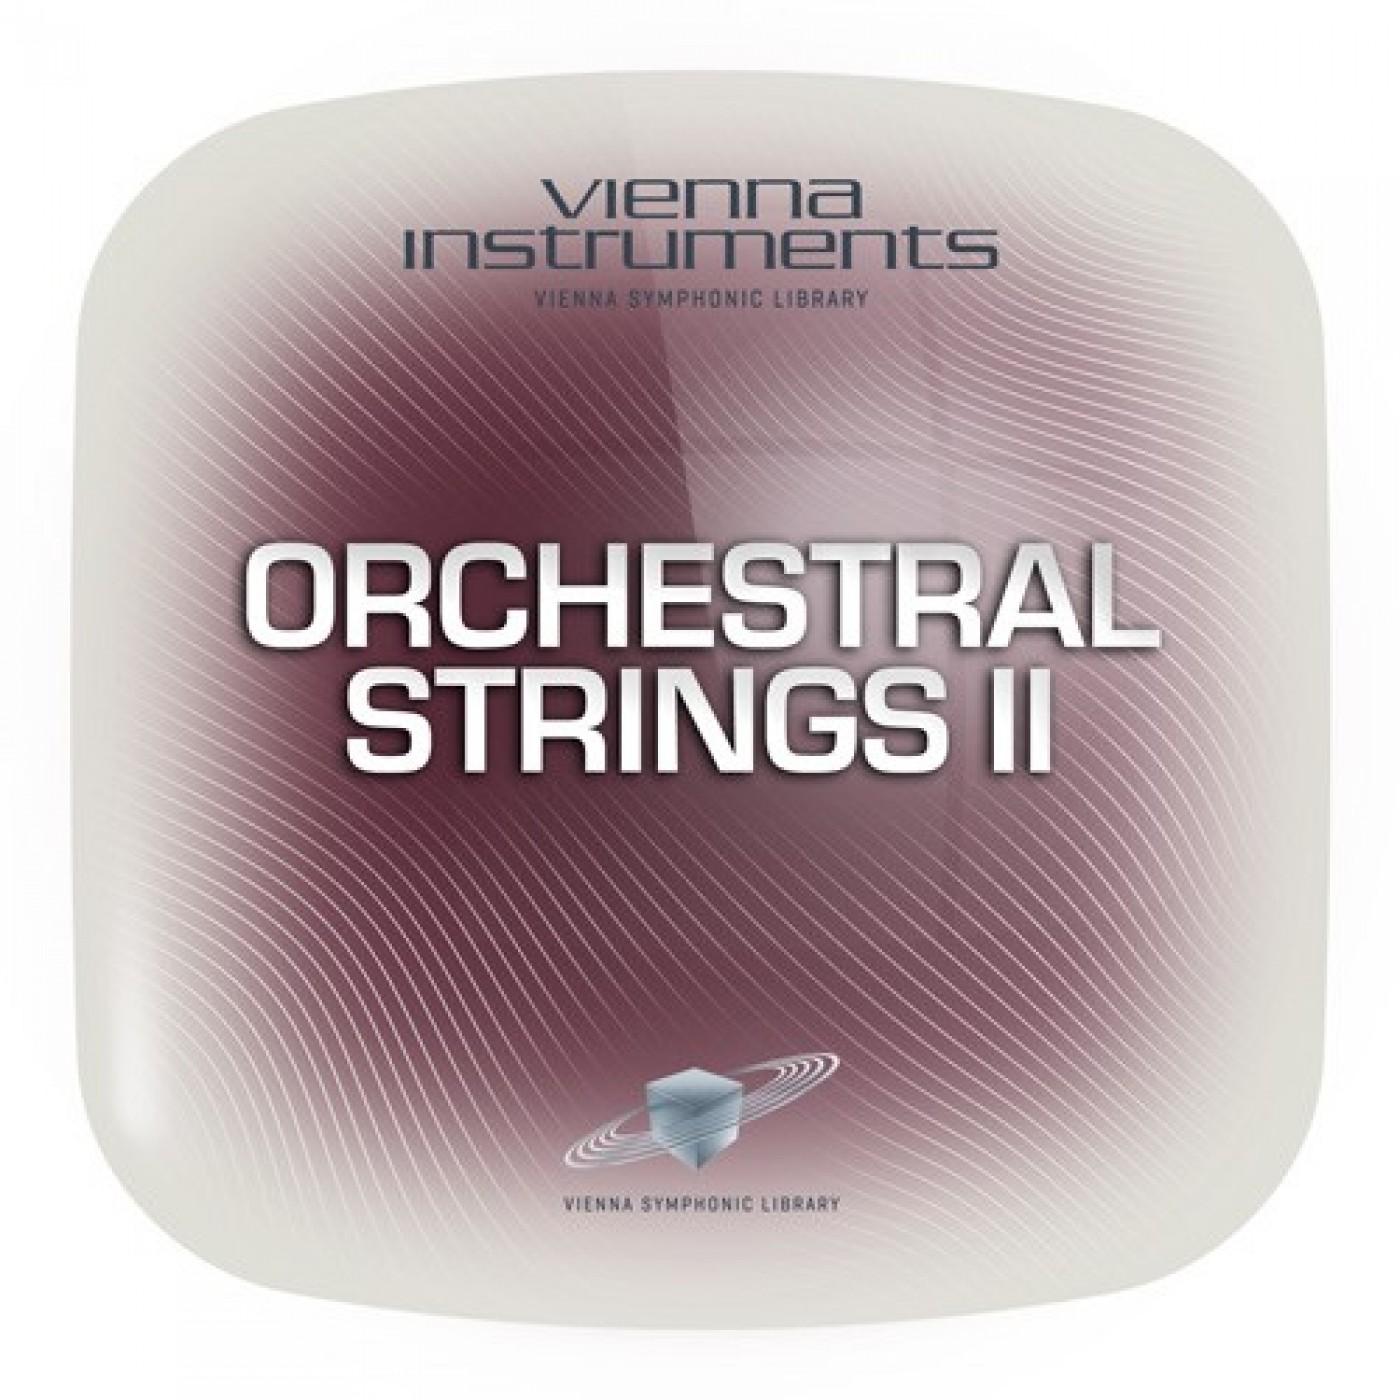 VSL ORQUESTRAL STRINGS II